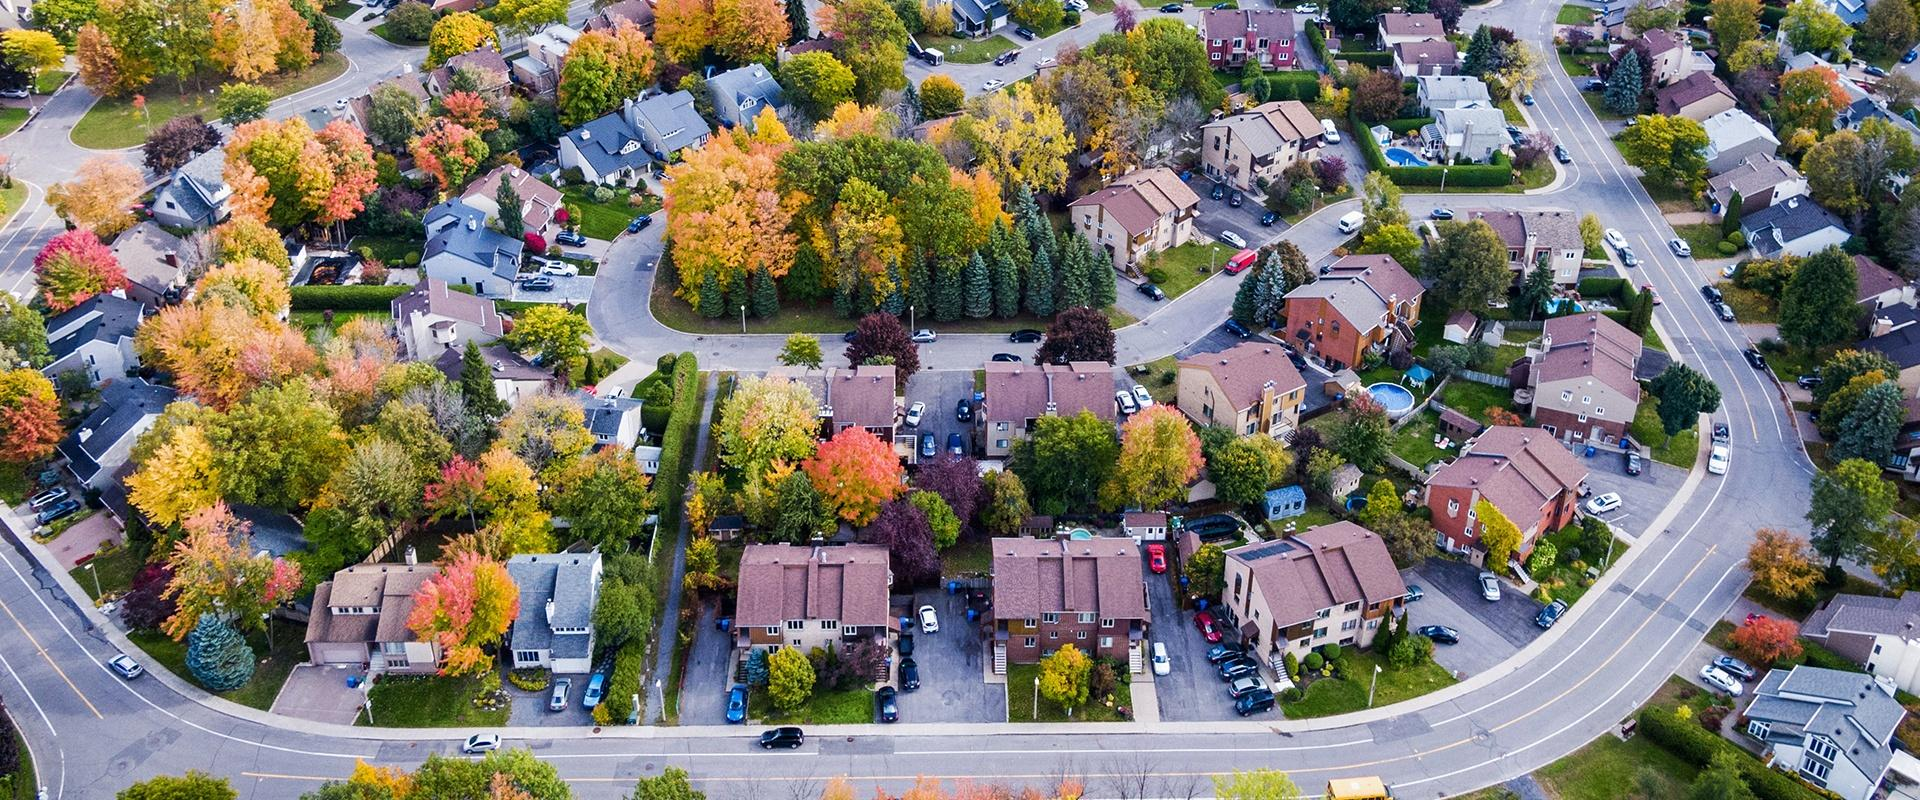 an overhead view of a residential neighborhood